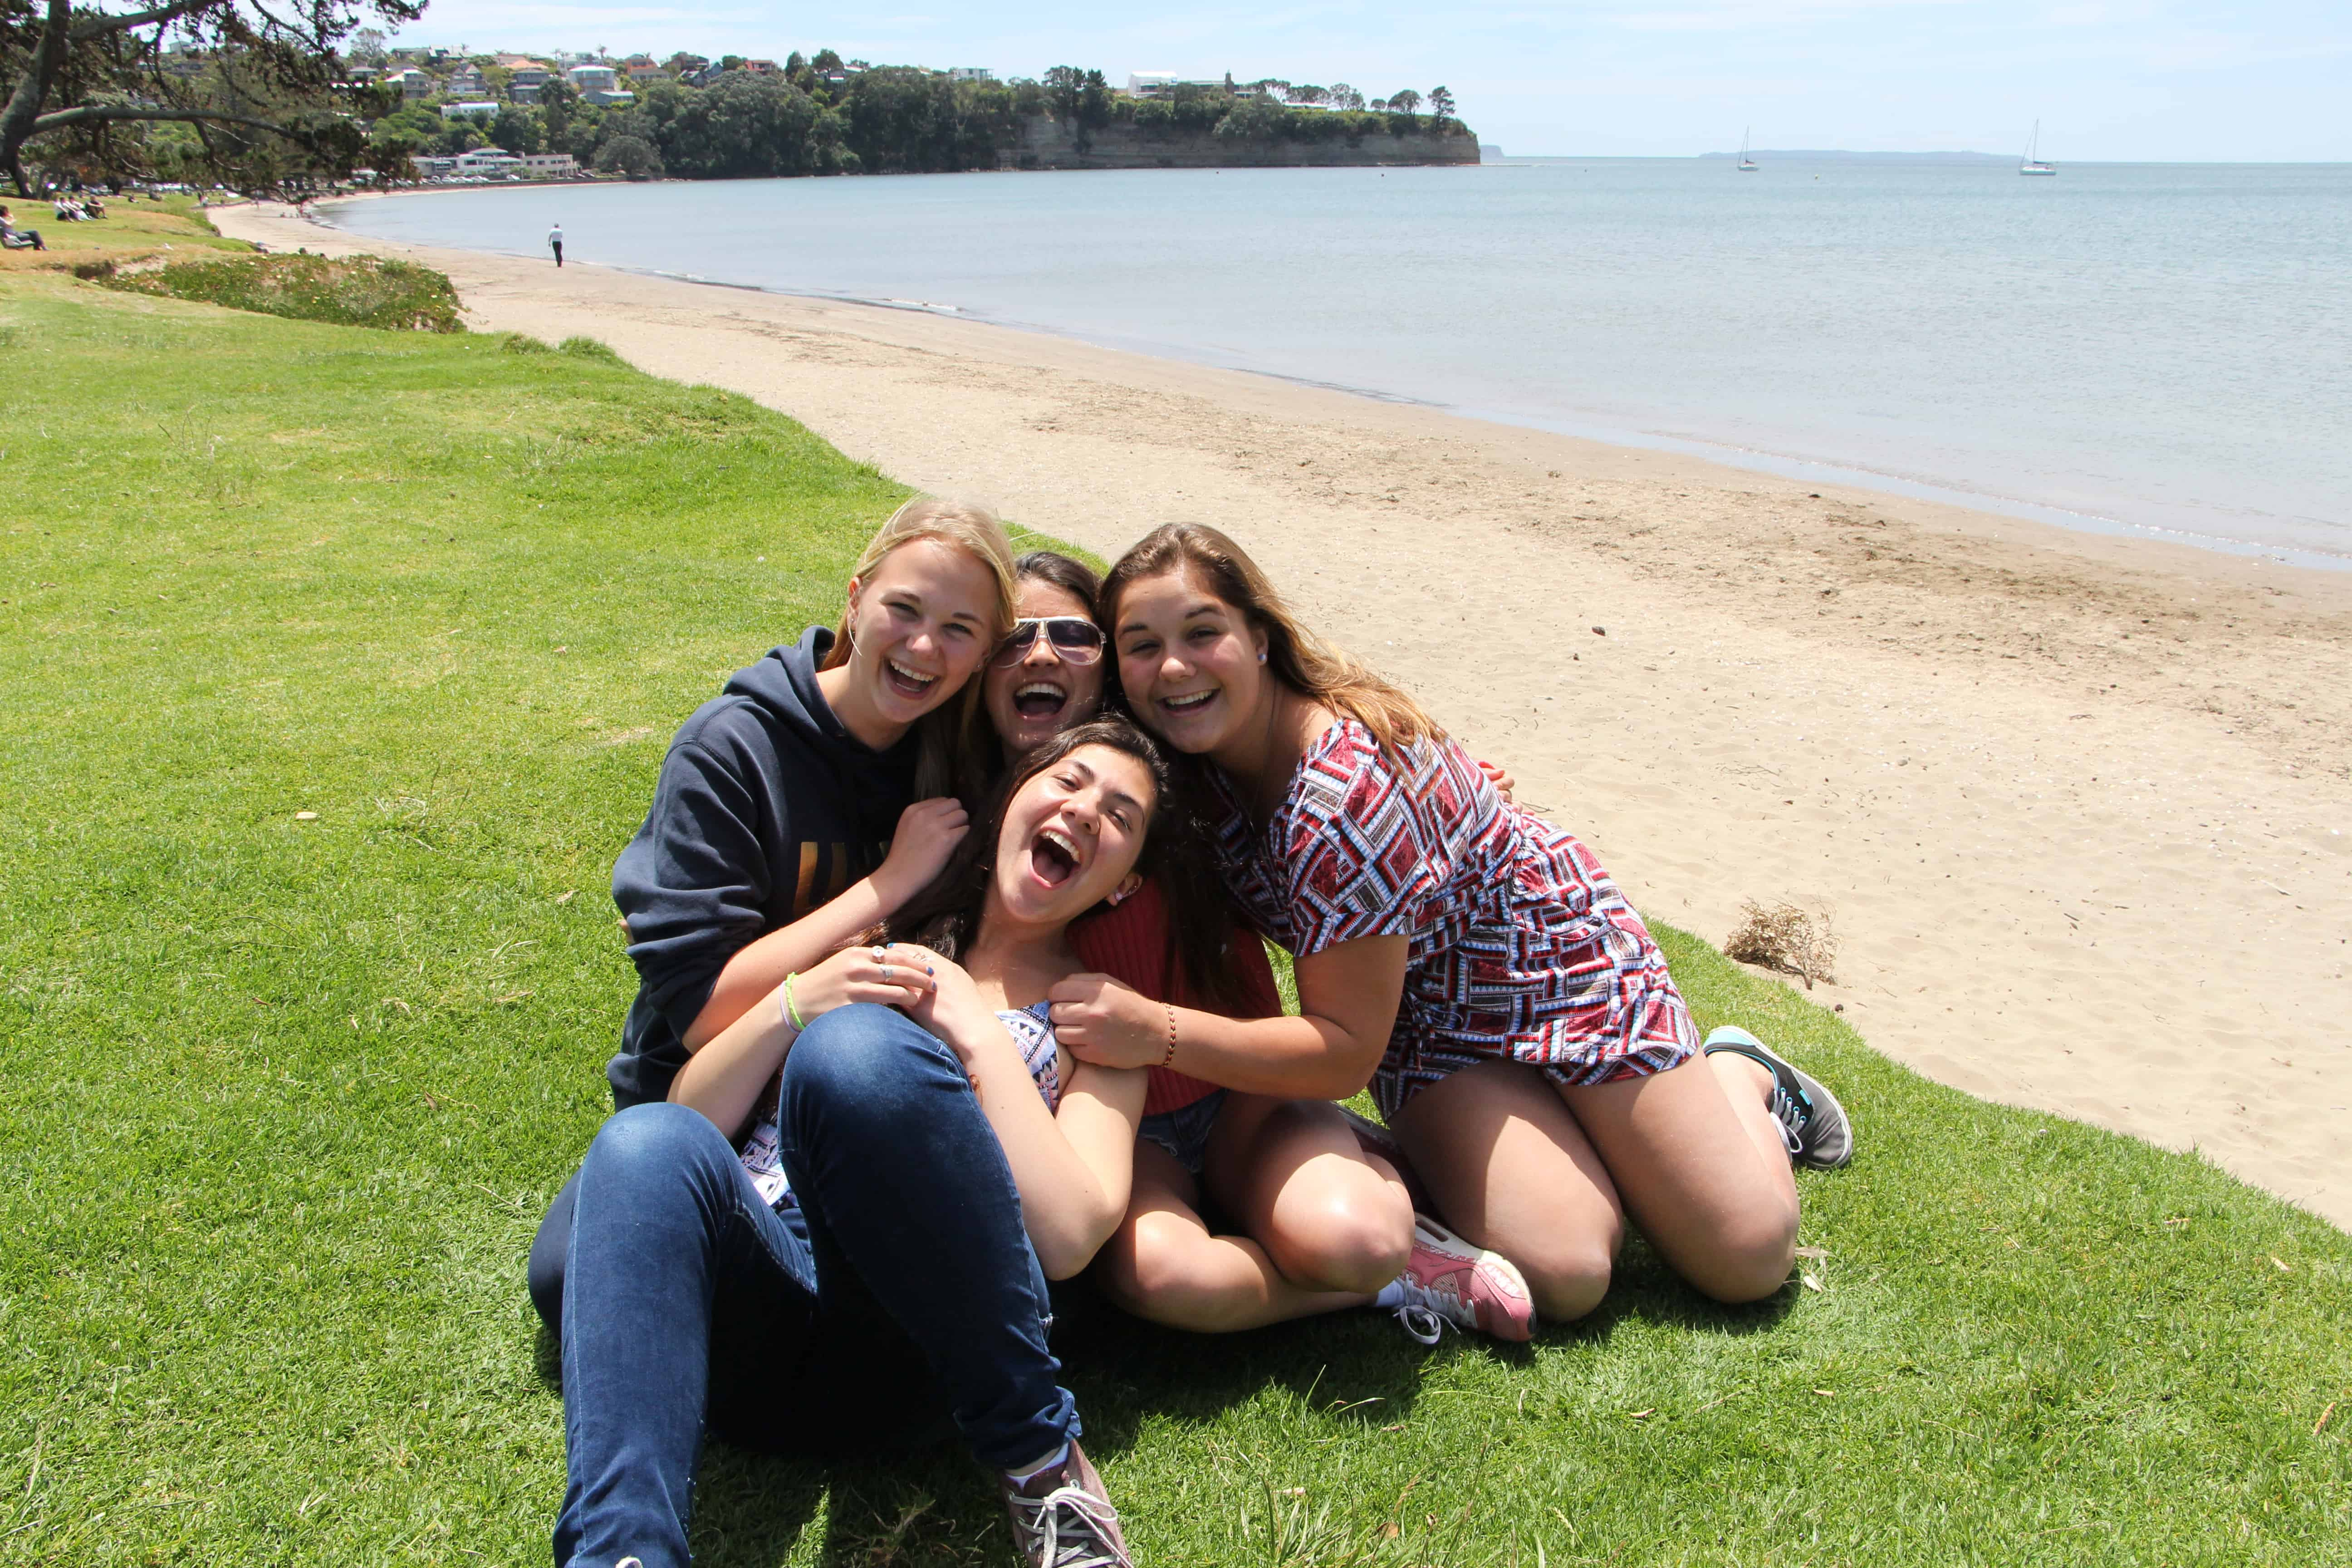 Schulen Tauranga | Schulen in Tauranga | High Schools Tauranga